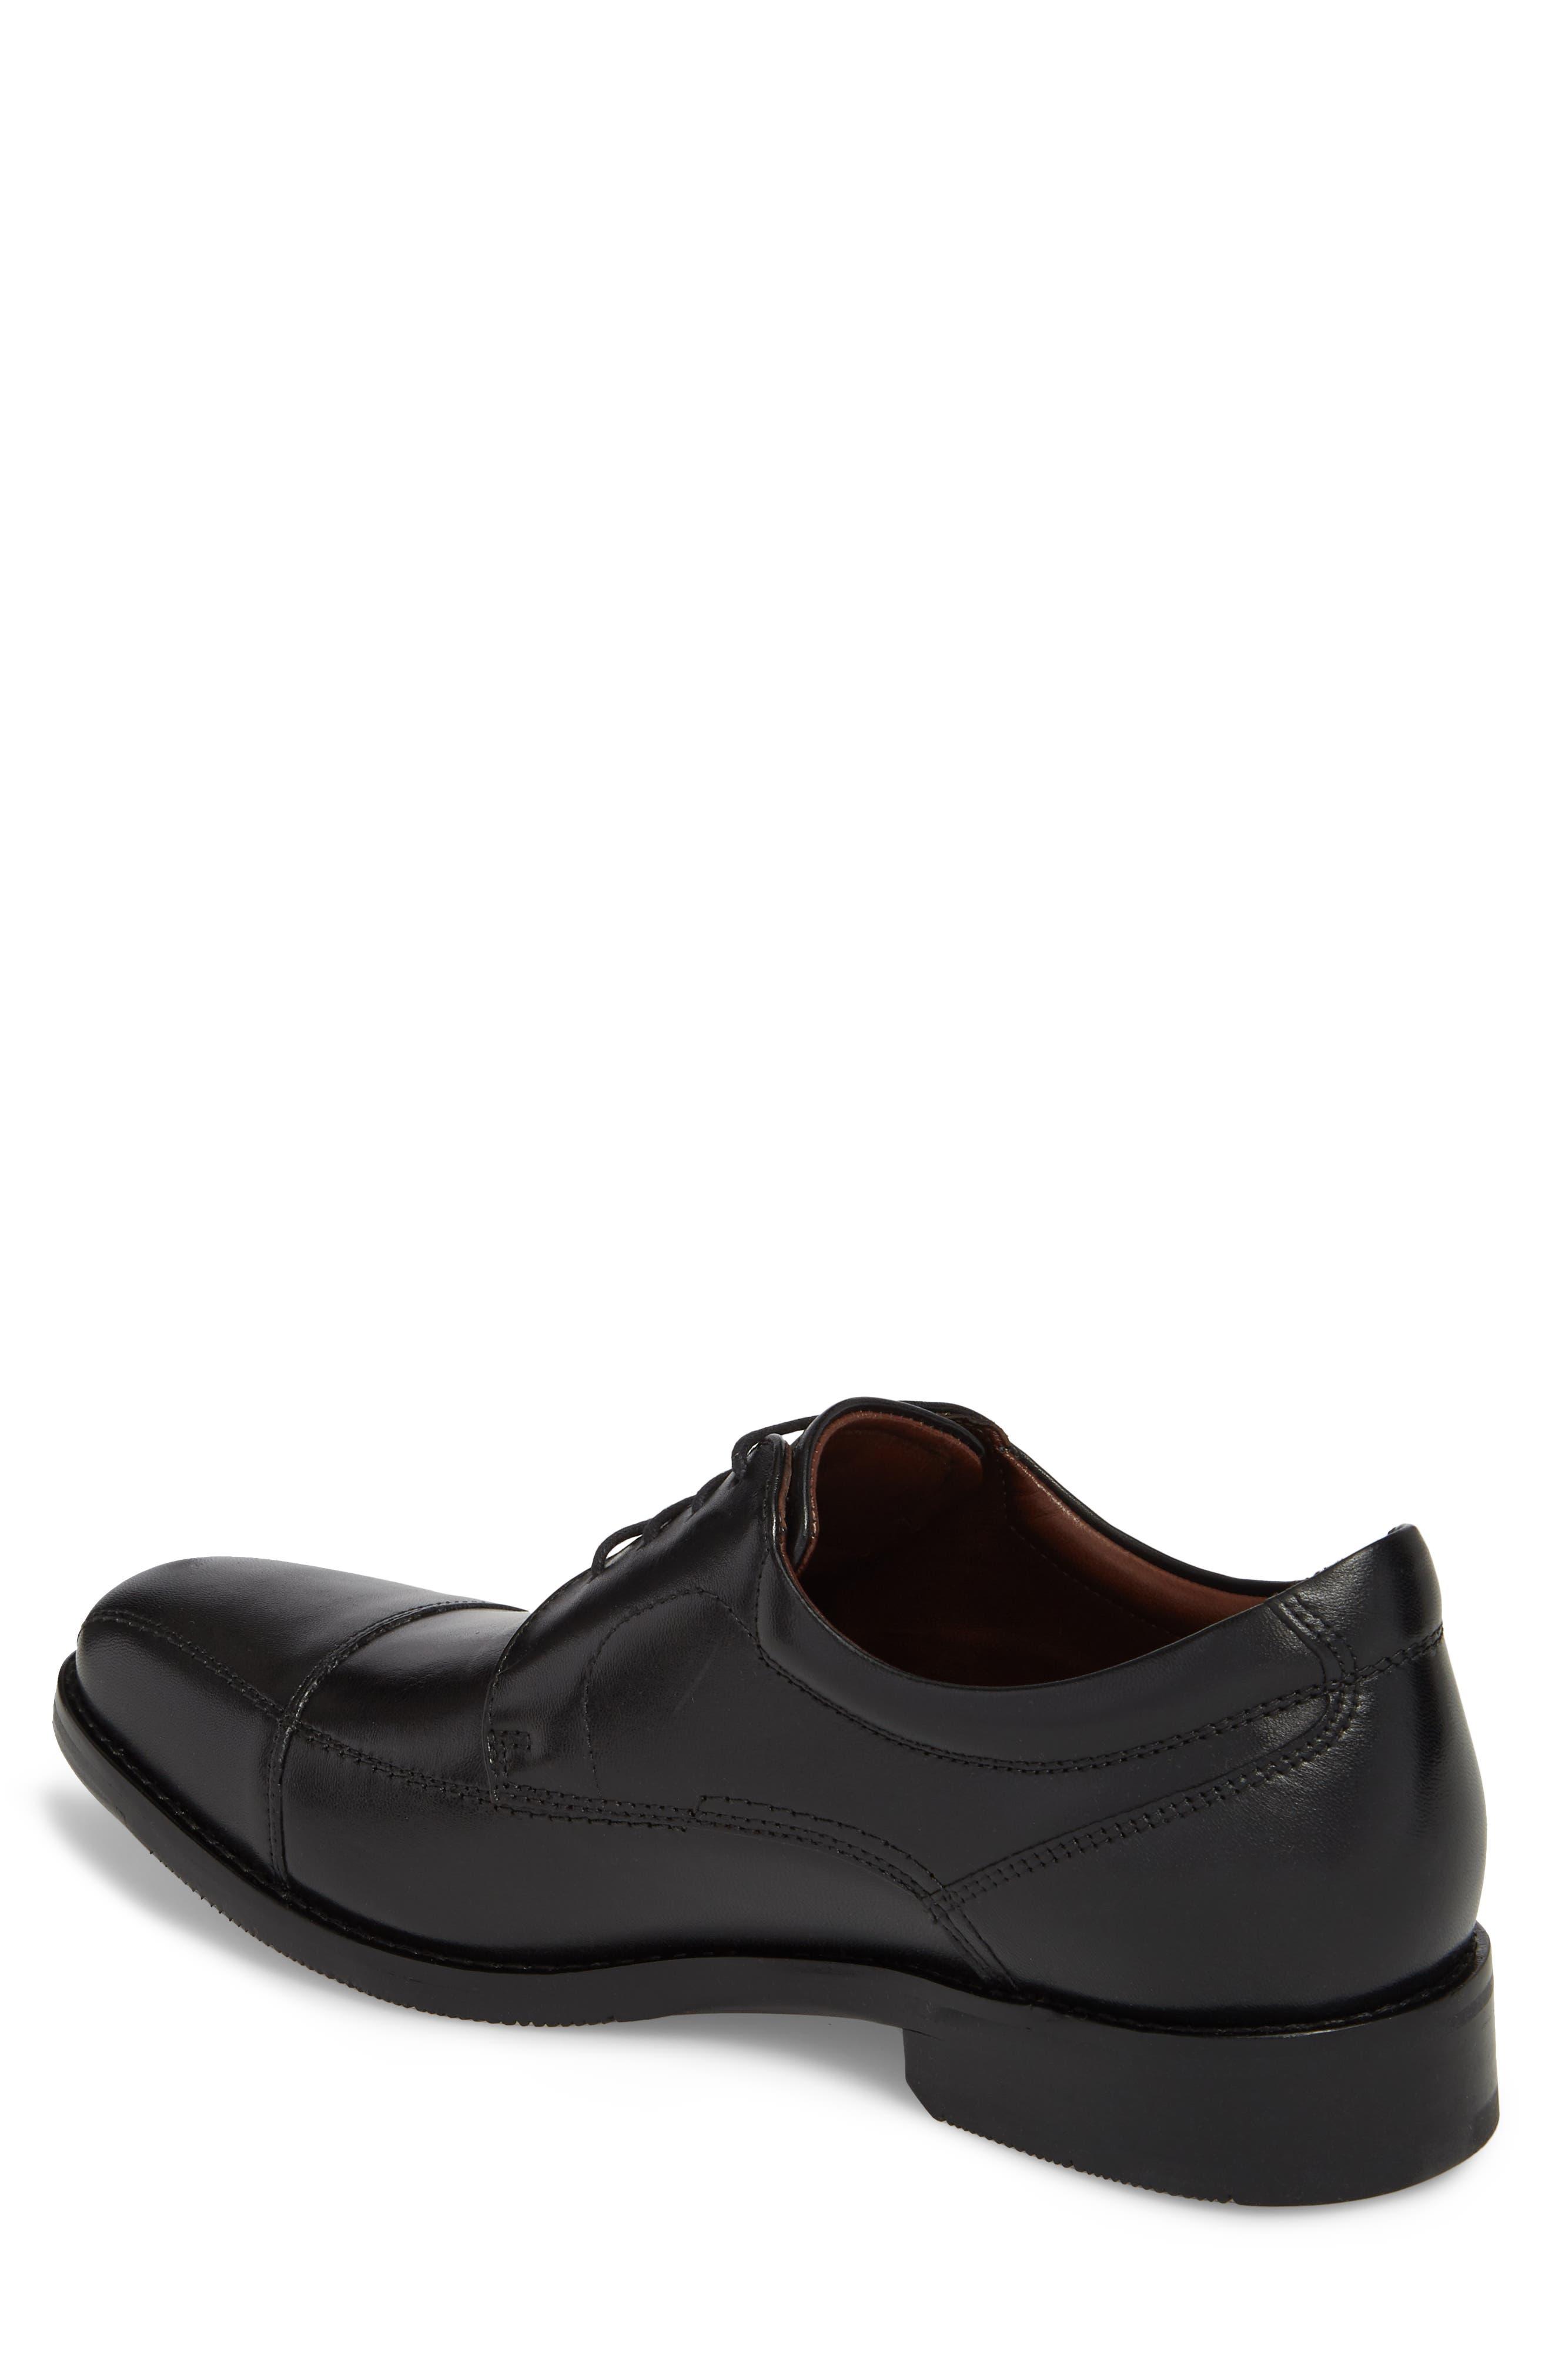 Bartlett Cap Toe Derby,                             Alternate thumbnail 2, color,                             Black Leather